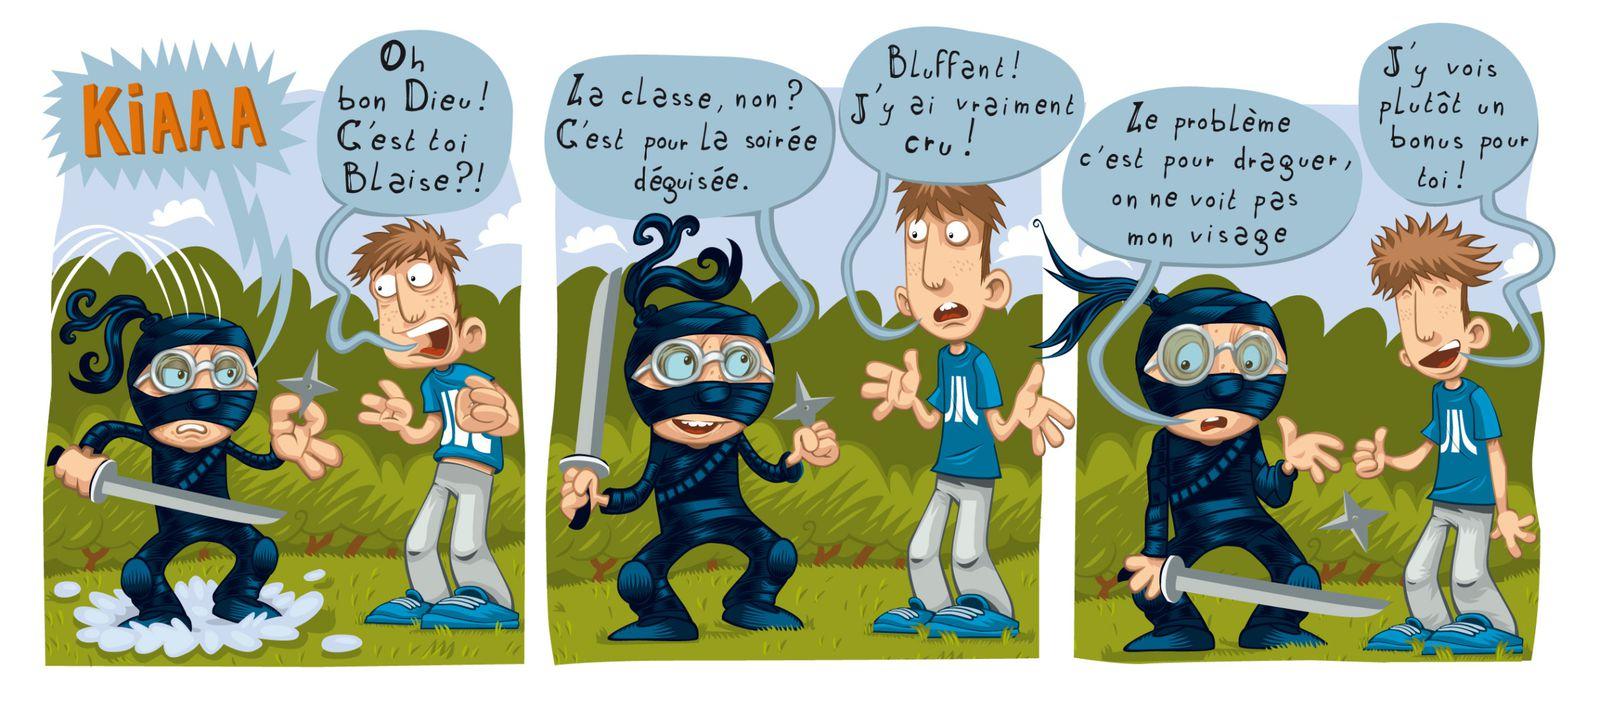 23-ninja-soiree-deguisee-drague-infundibulum.jpg